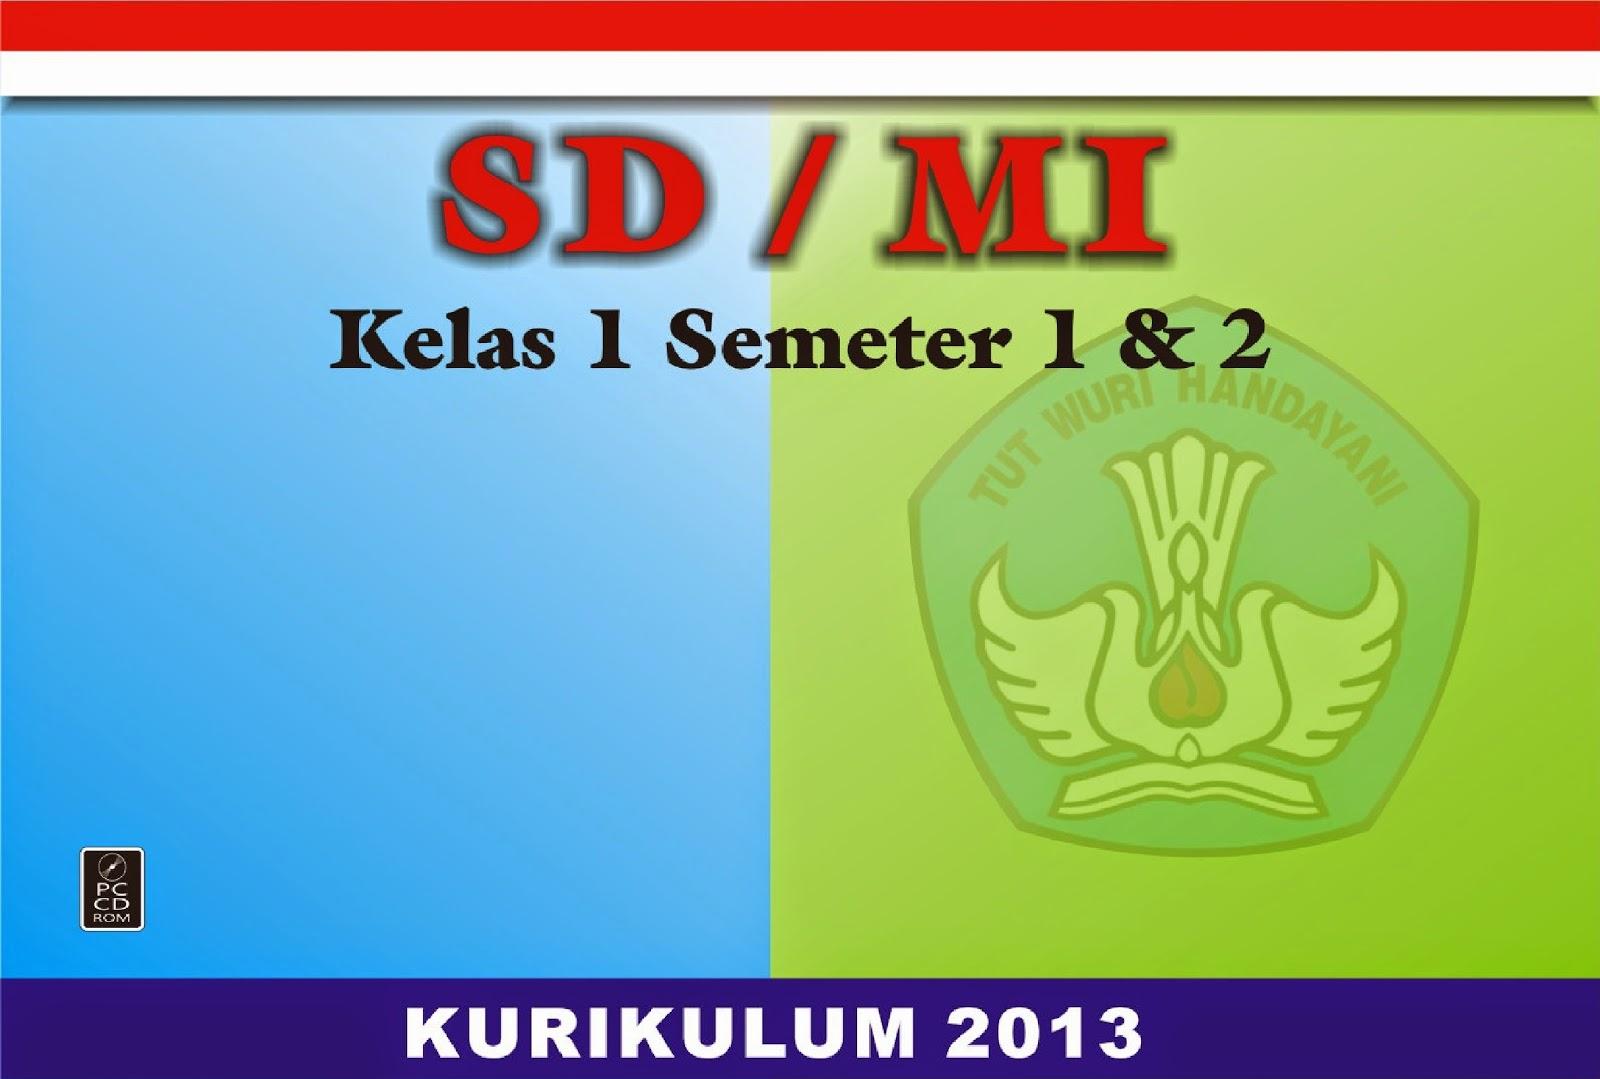 Adminstrasi Kelas I Kurikulum 2013 Revisi Id